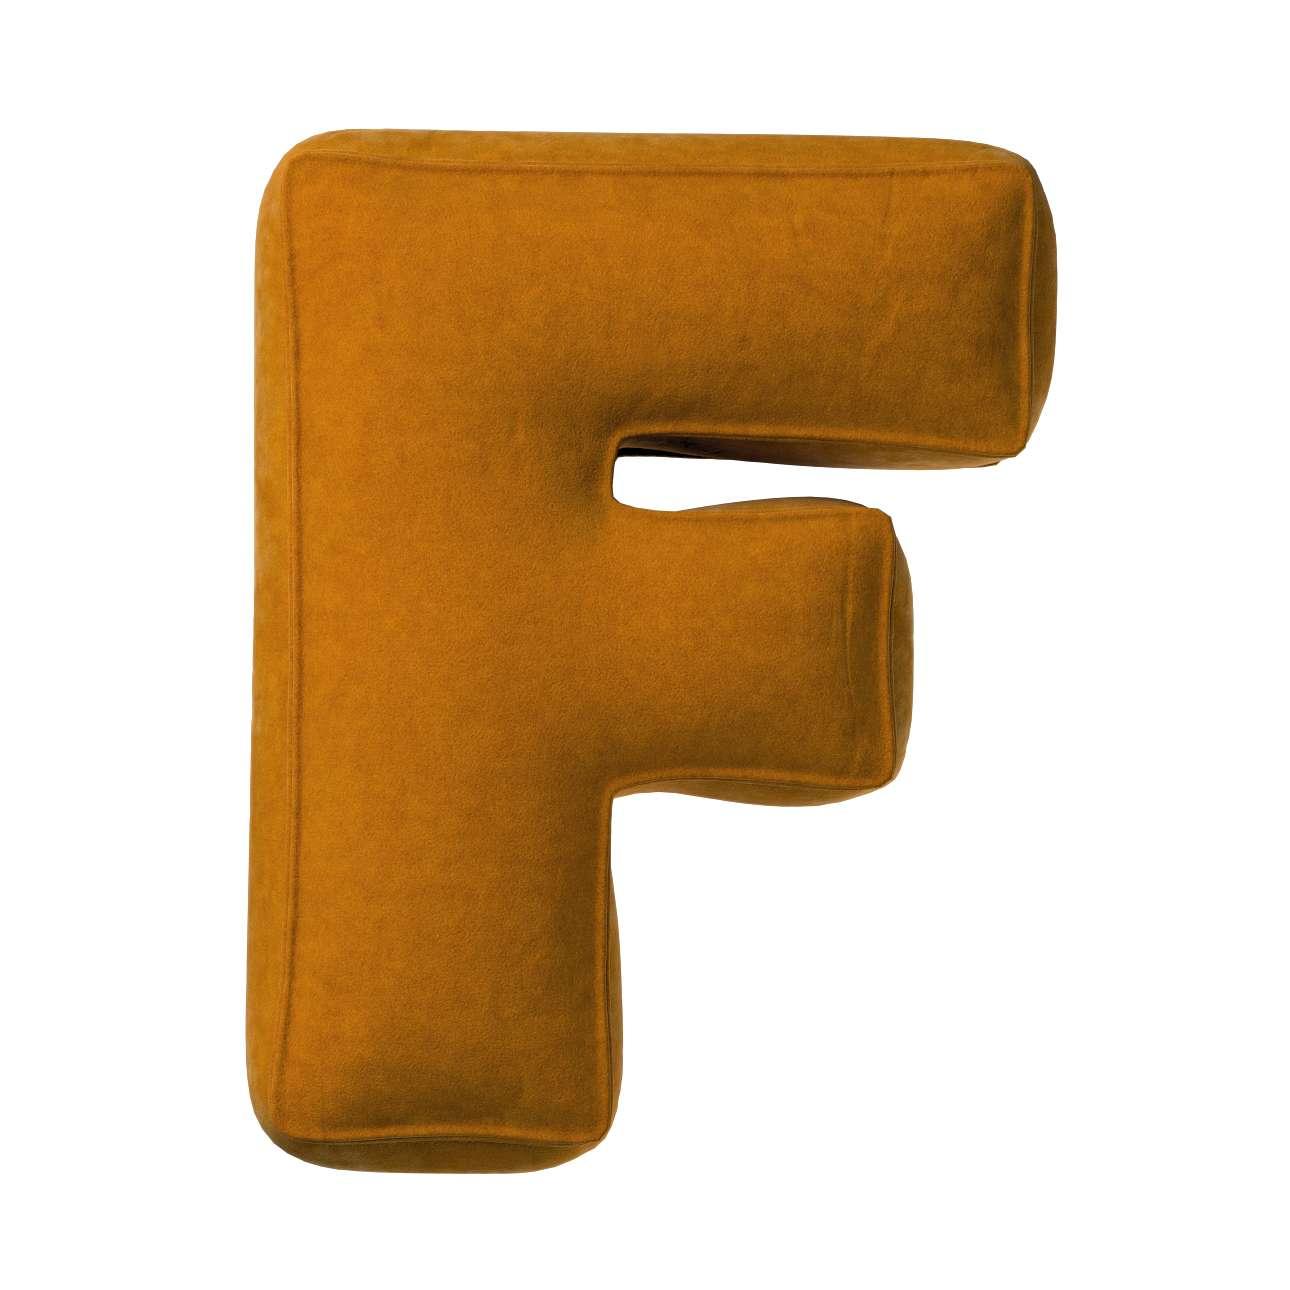 Letter pillow F in collection Posh Velvet, fabric: 704-23